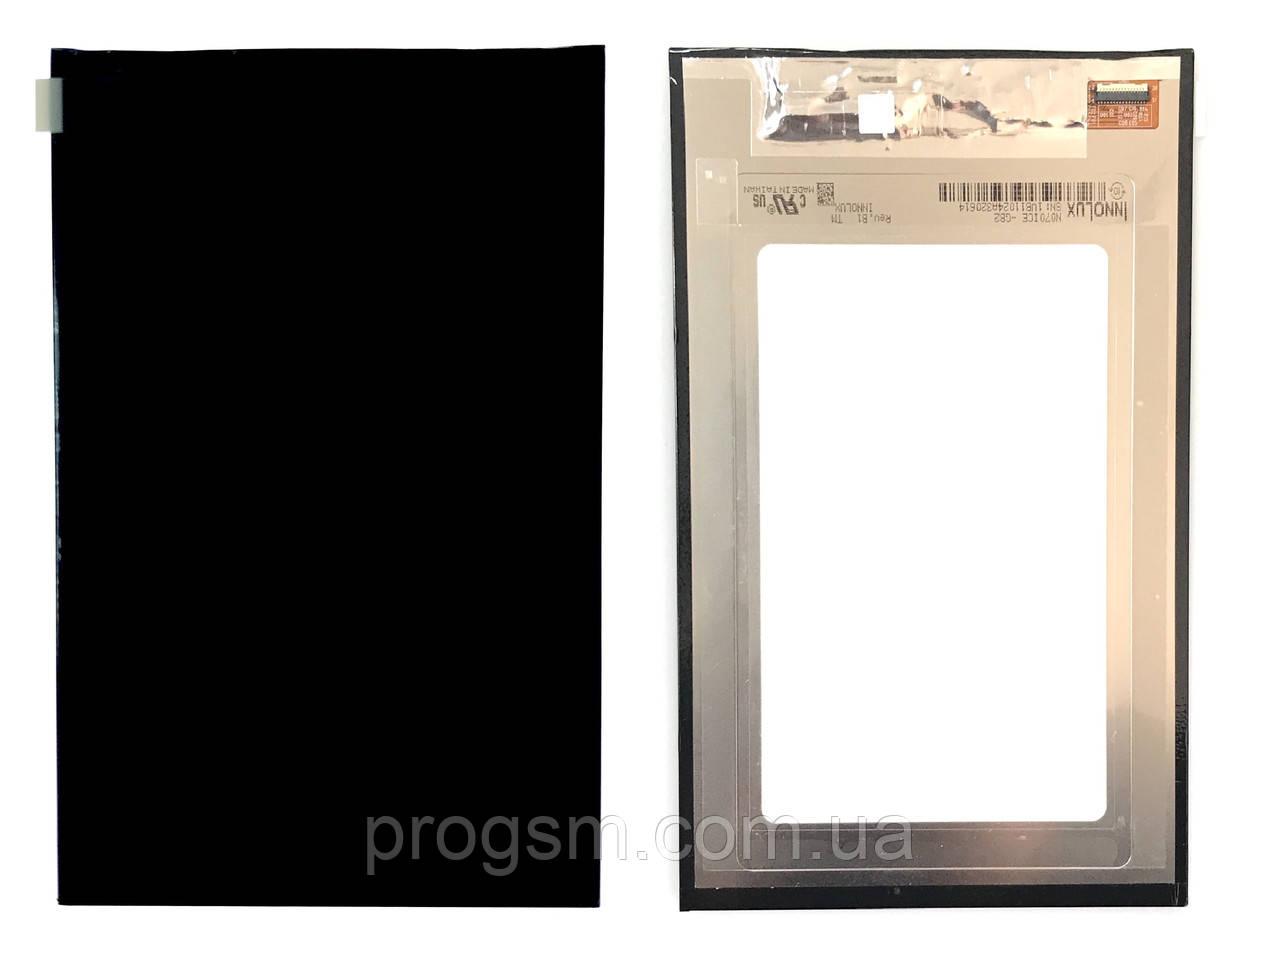 Дисплей Nomi Corsa C070010 103 x 162 mm 30 pin (pn N070iCE-GB2 rev.B1)